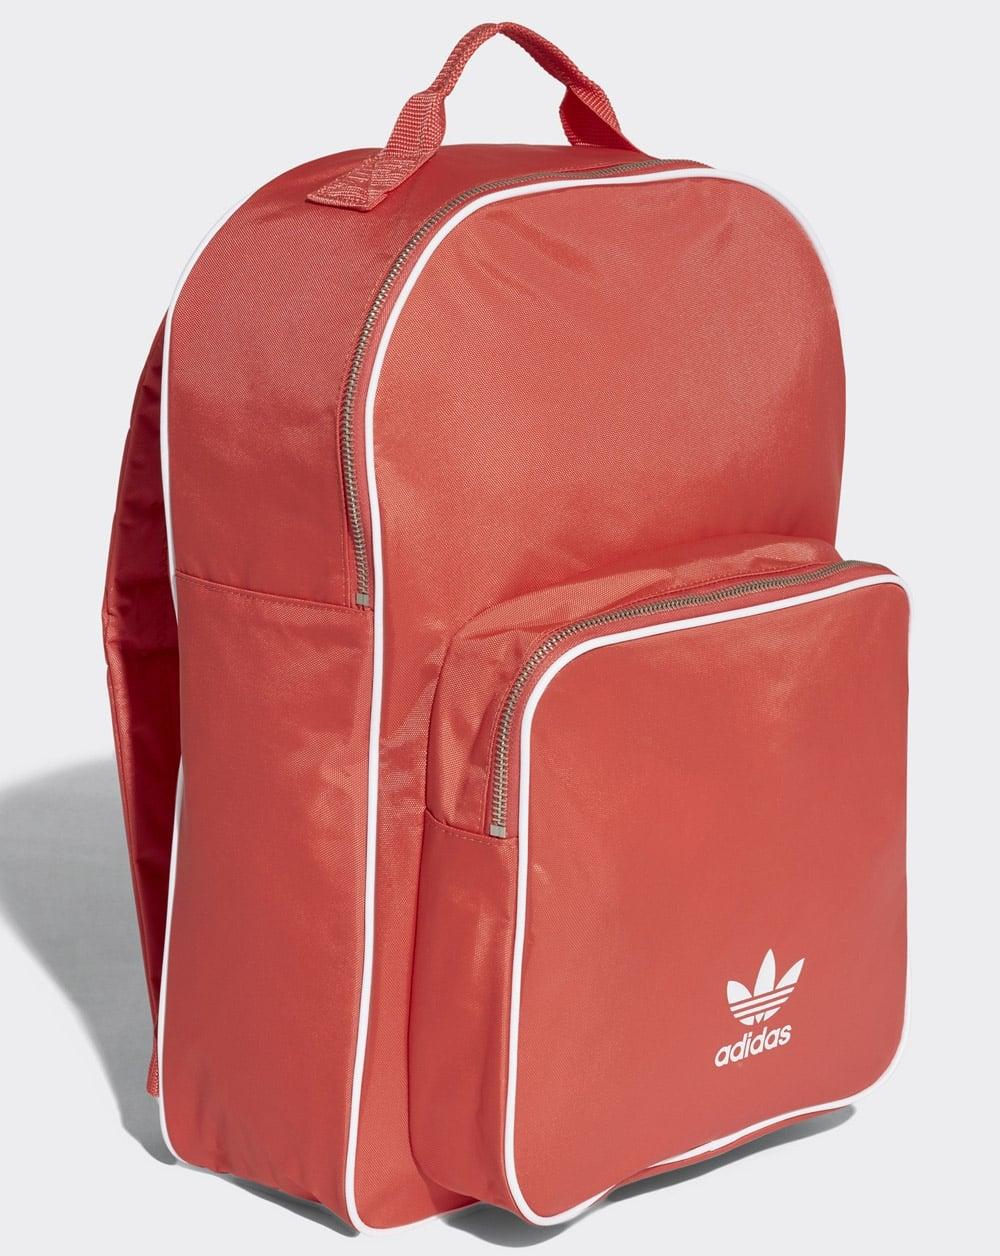 ac0c2761805 Adidas Originals Adicolor Backpack Trace Scarlet, Bags, Mens, Laptop